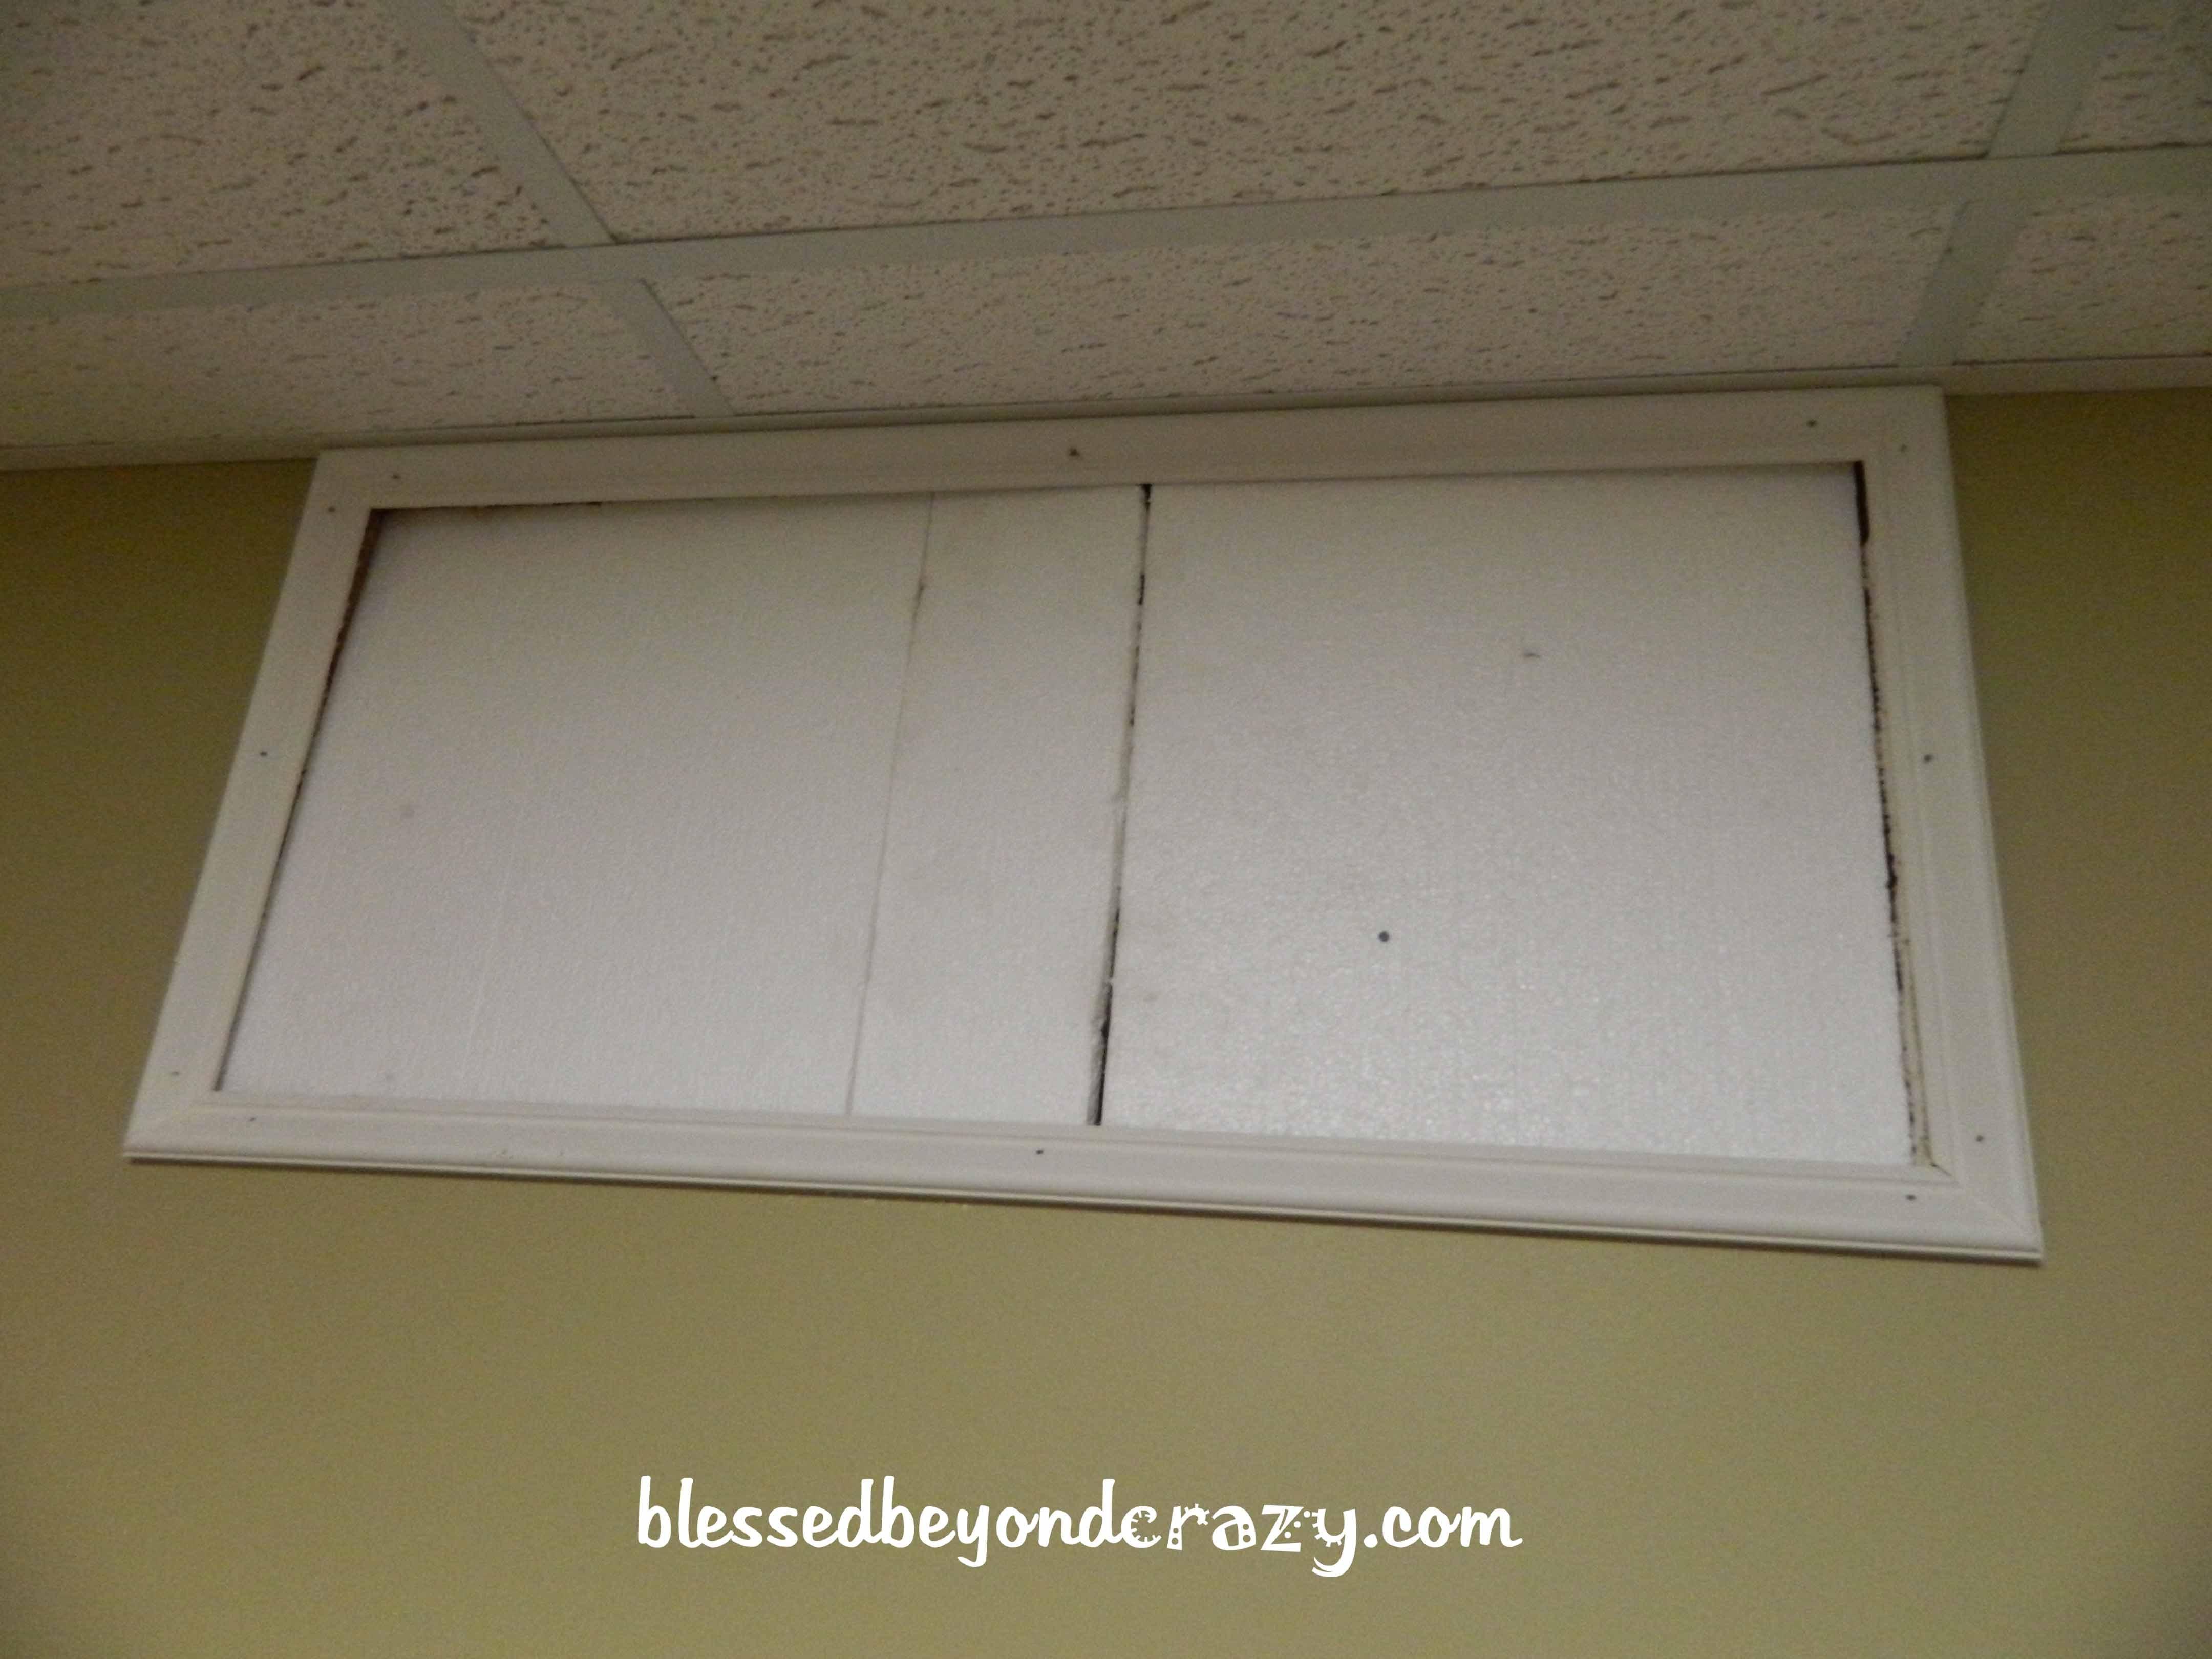 Insulate Basement Windows For Winter